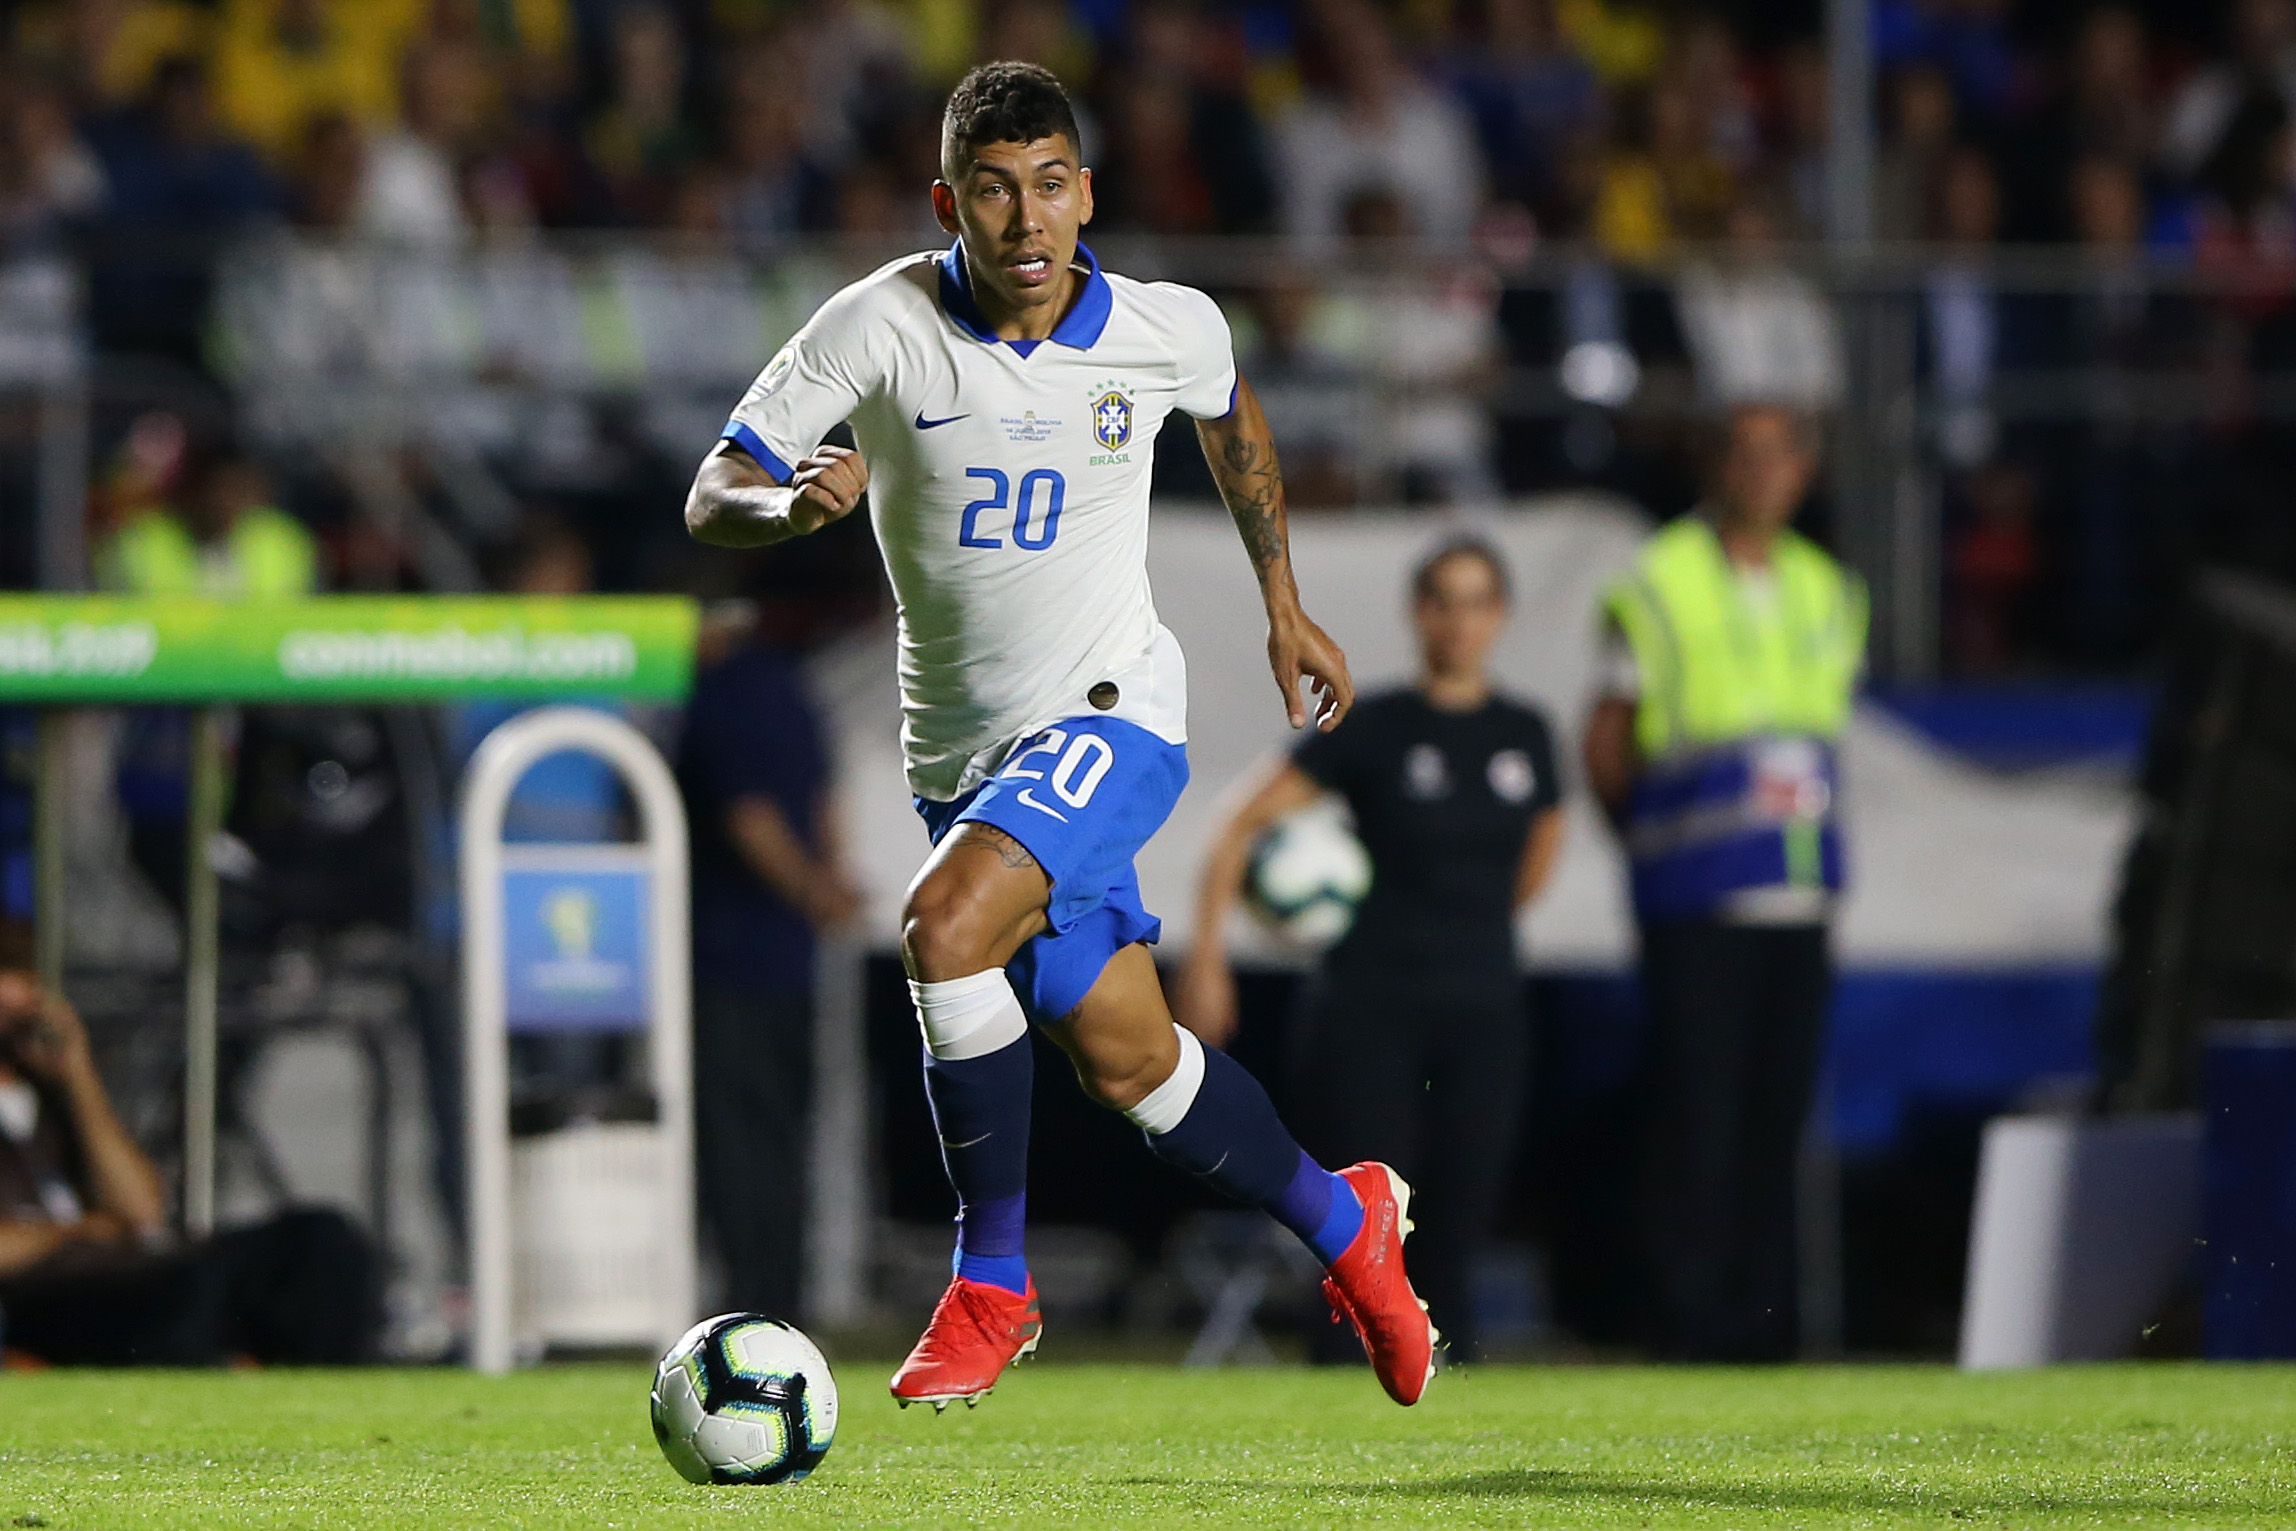 Liverpool Internationals Watch: Alisson, Firmino, Salah All Feature